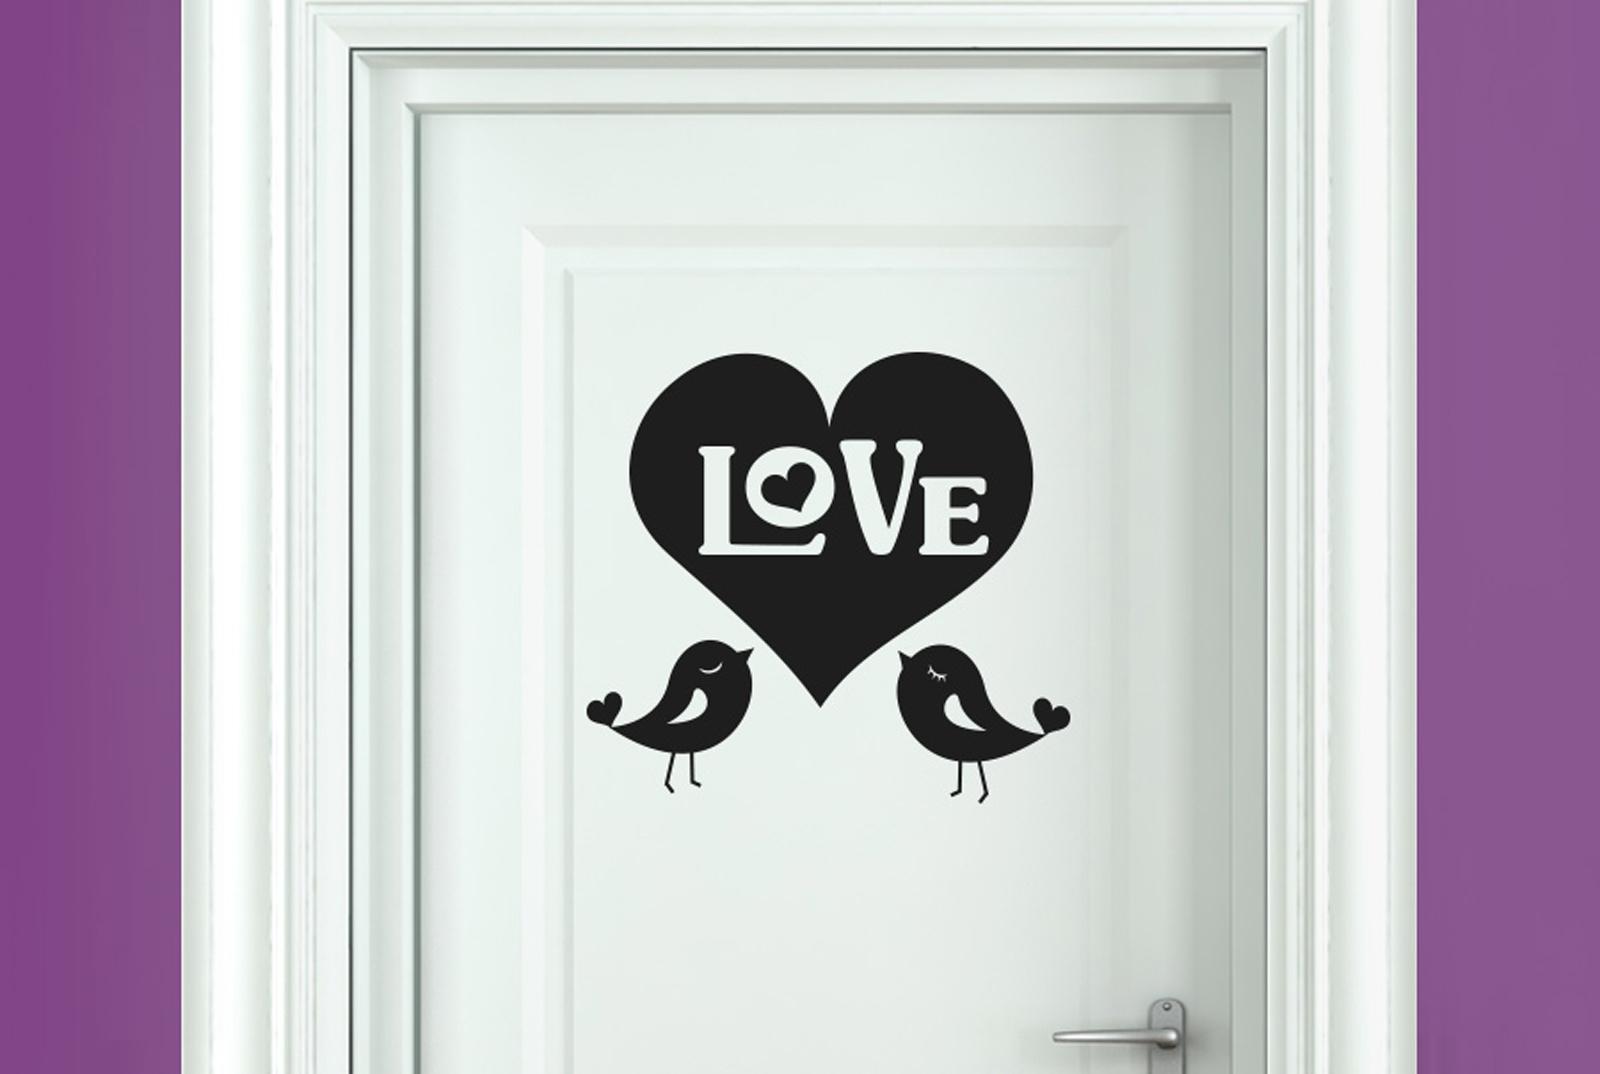 Details About Big Love Heart With Two Cute Birds Room Door Wall Stickers Vinyl Art Decals